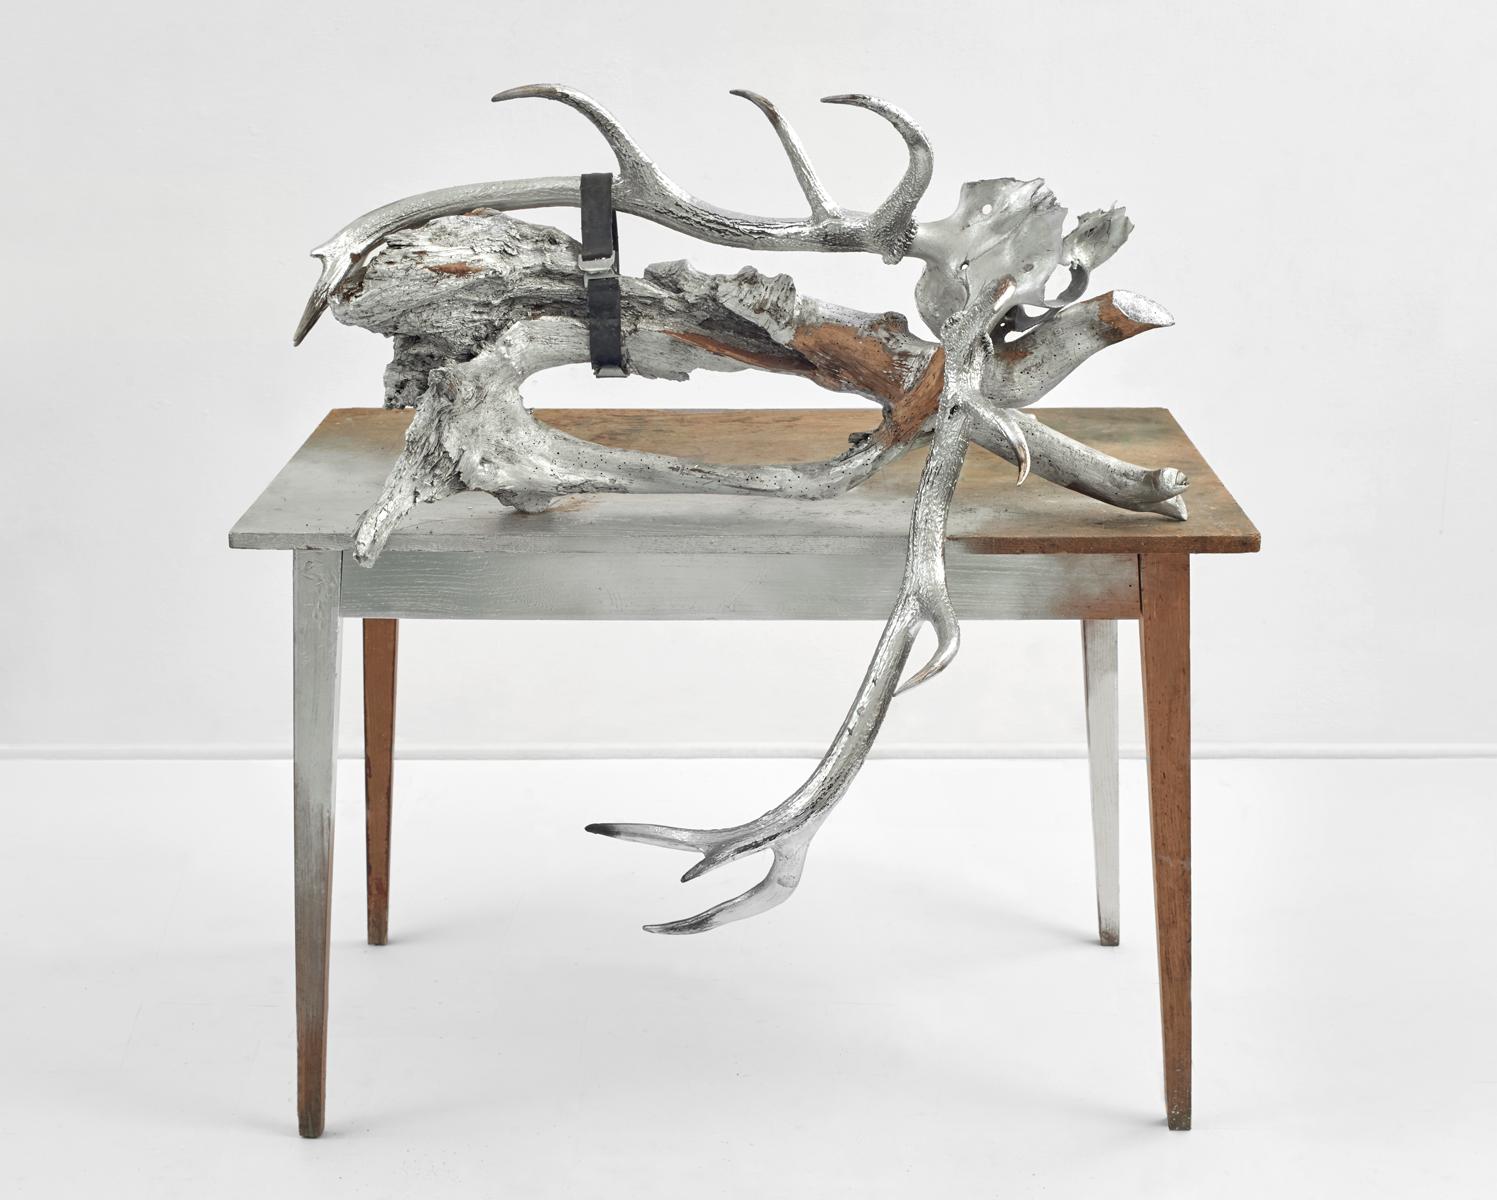 ACTUS PURUS / Bough / 2016 / 100 x 141 x 83 cm / table, bough, horns, strapping belt, enamel